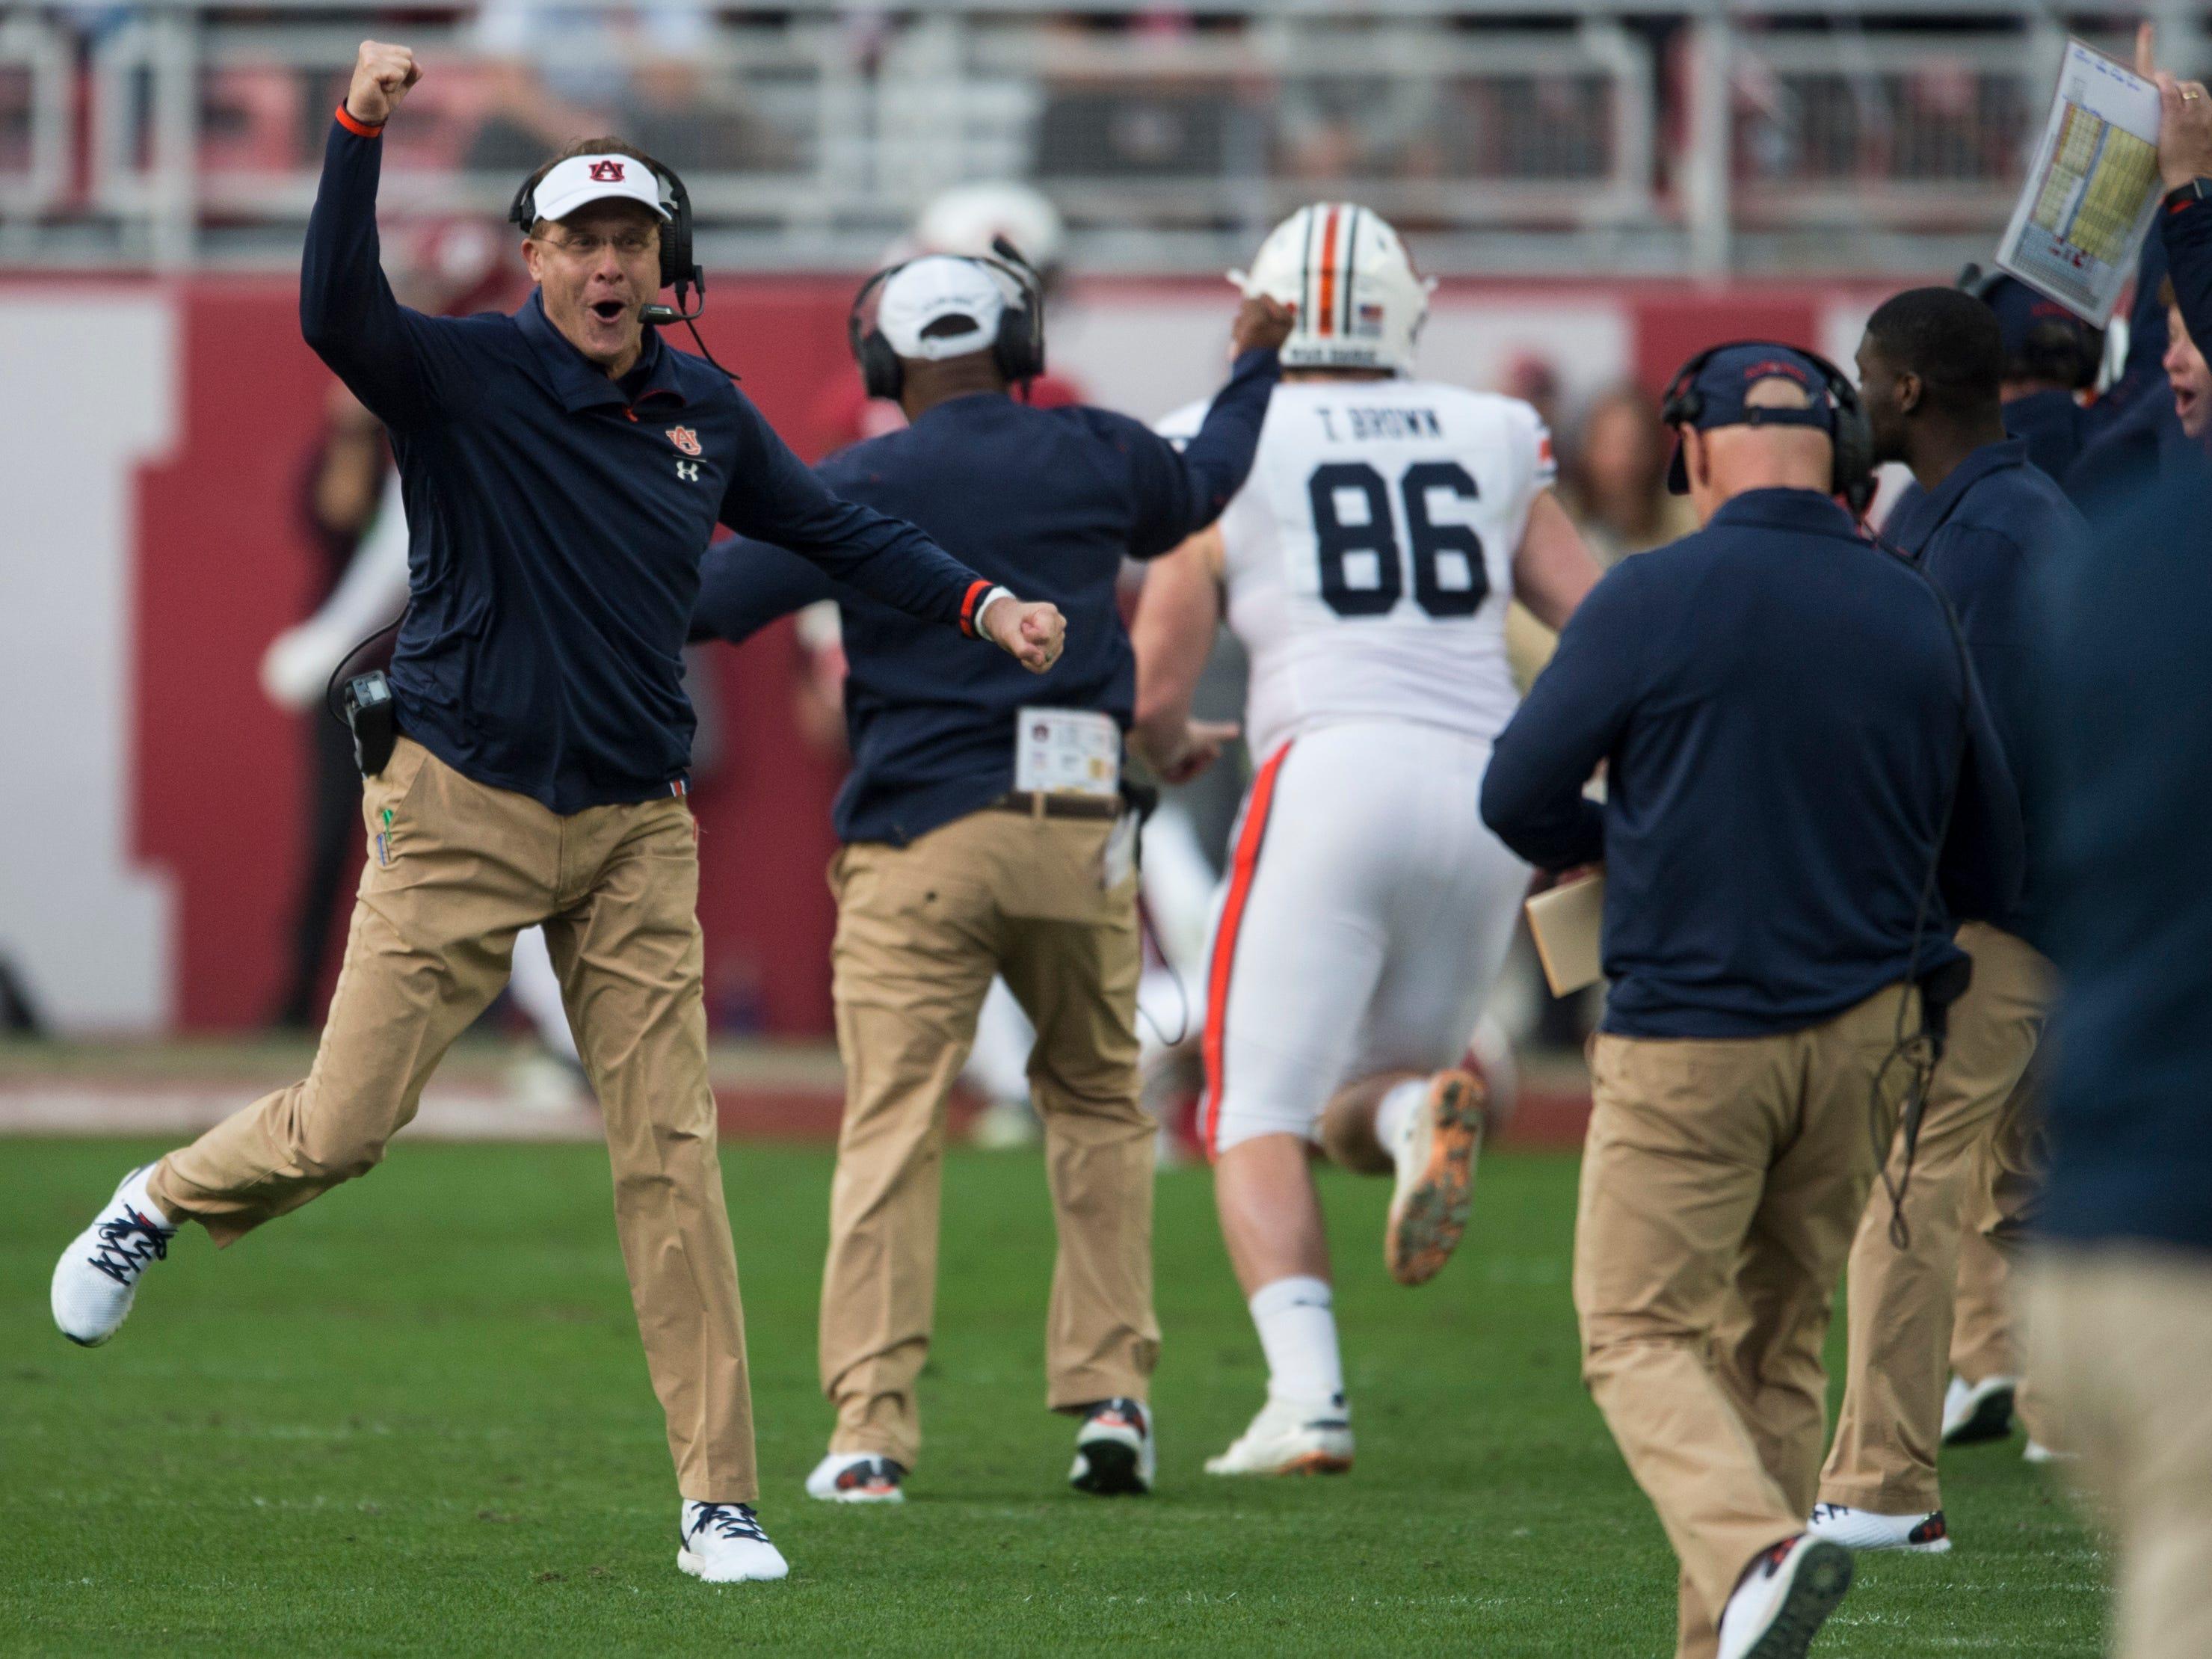 Auburn head coach Gus Malzahn celebrates a touchdown during the Iron Bowl at Bryant-Denny Stadium in Tuscaloosa, Ala., on Saturday, Nov. 24, 2018. Alabama leads Auburn 17-14 at halftime.